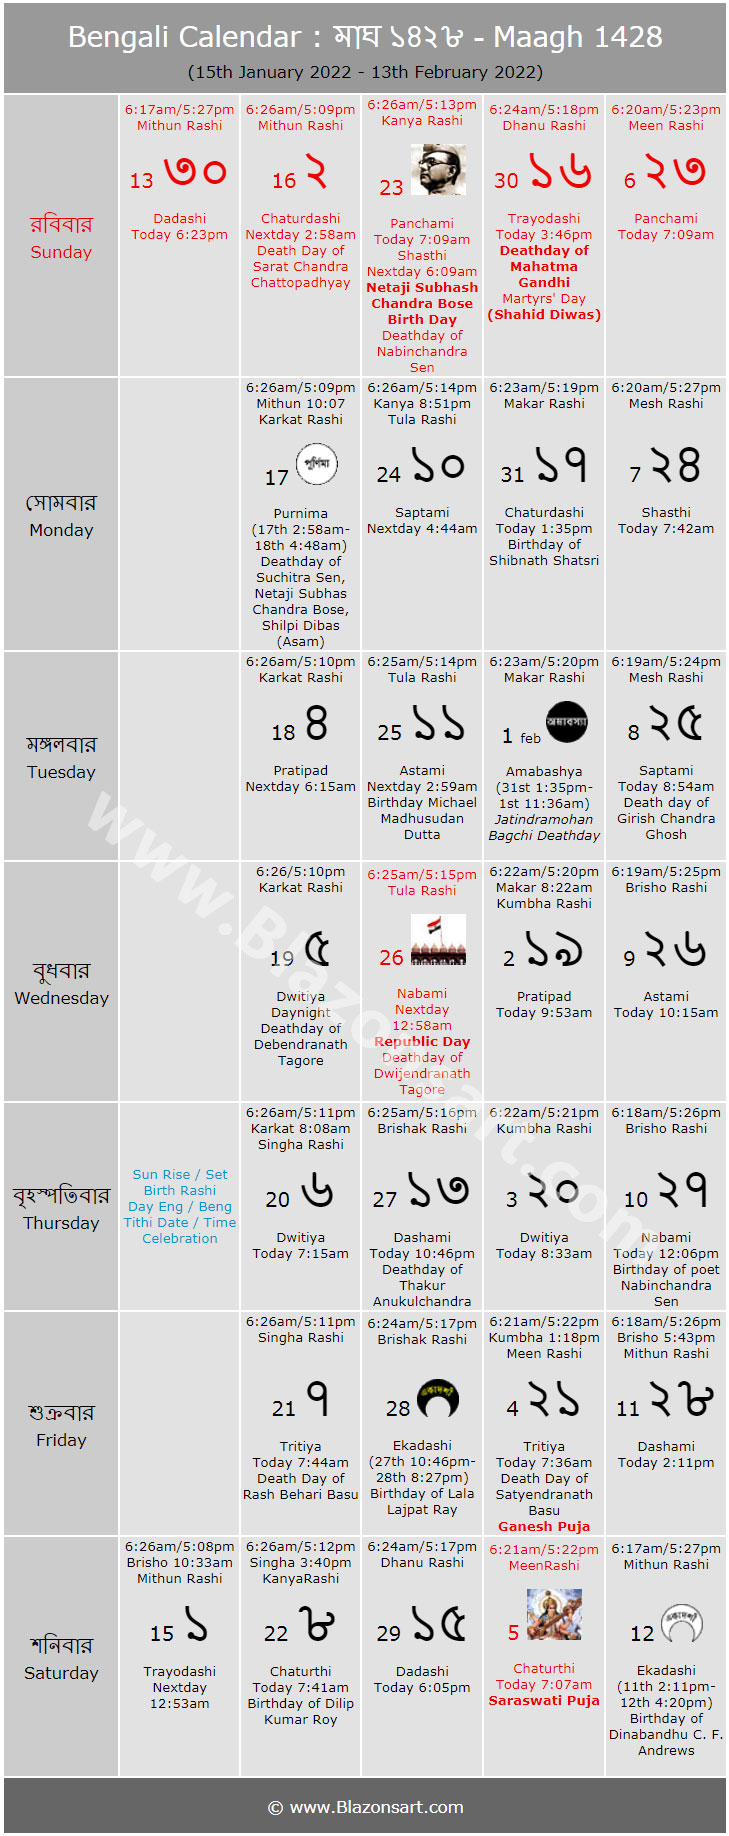 Bengali Calendar Maagh 1426 বাংলা কালেন্ডার মাঘ ১৪২৬